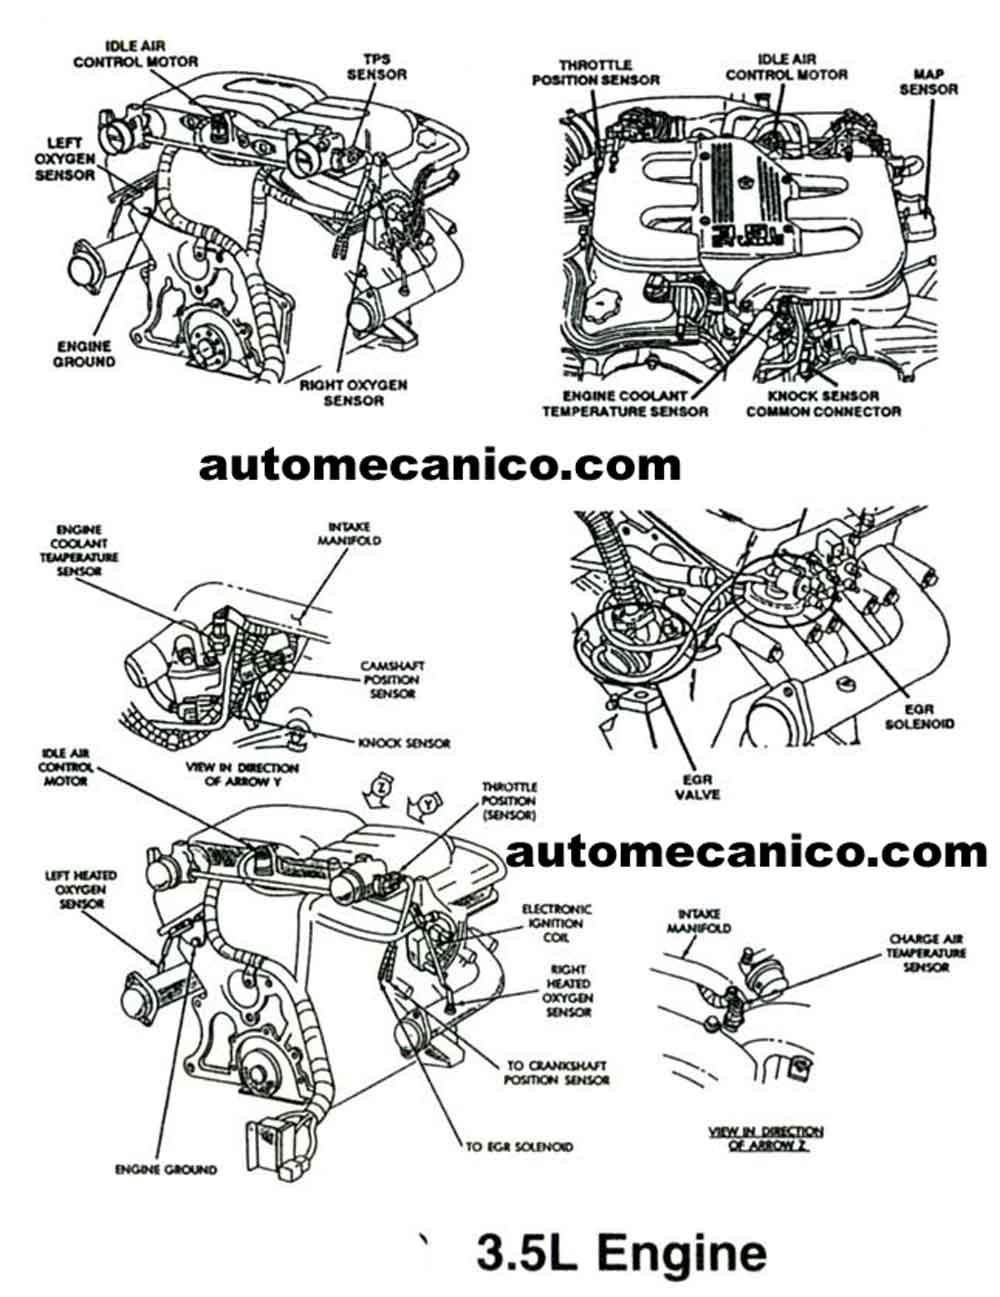 Motor 3.5L